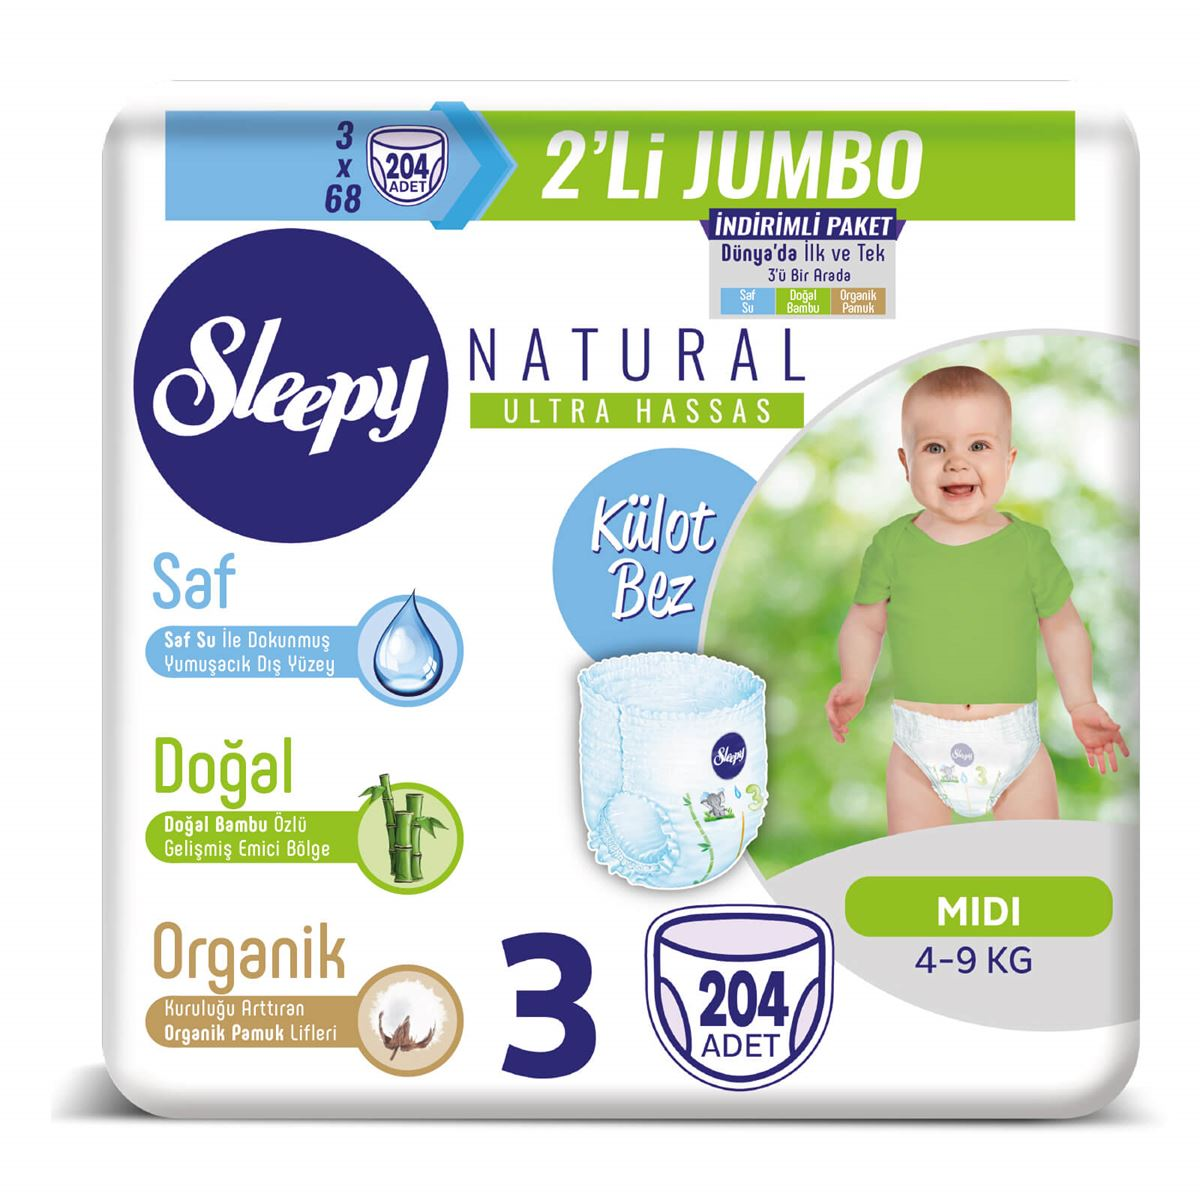 Sleepy Natural Külot Bez 3 Numara Midi 3X2'Lİ JUMBO